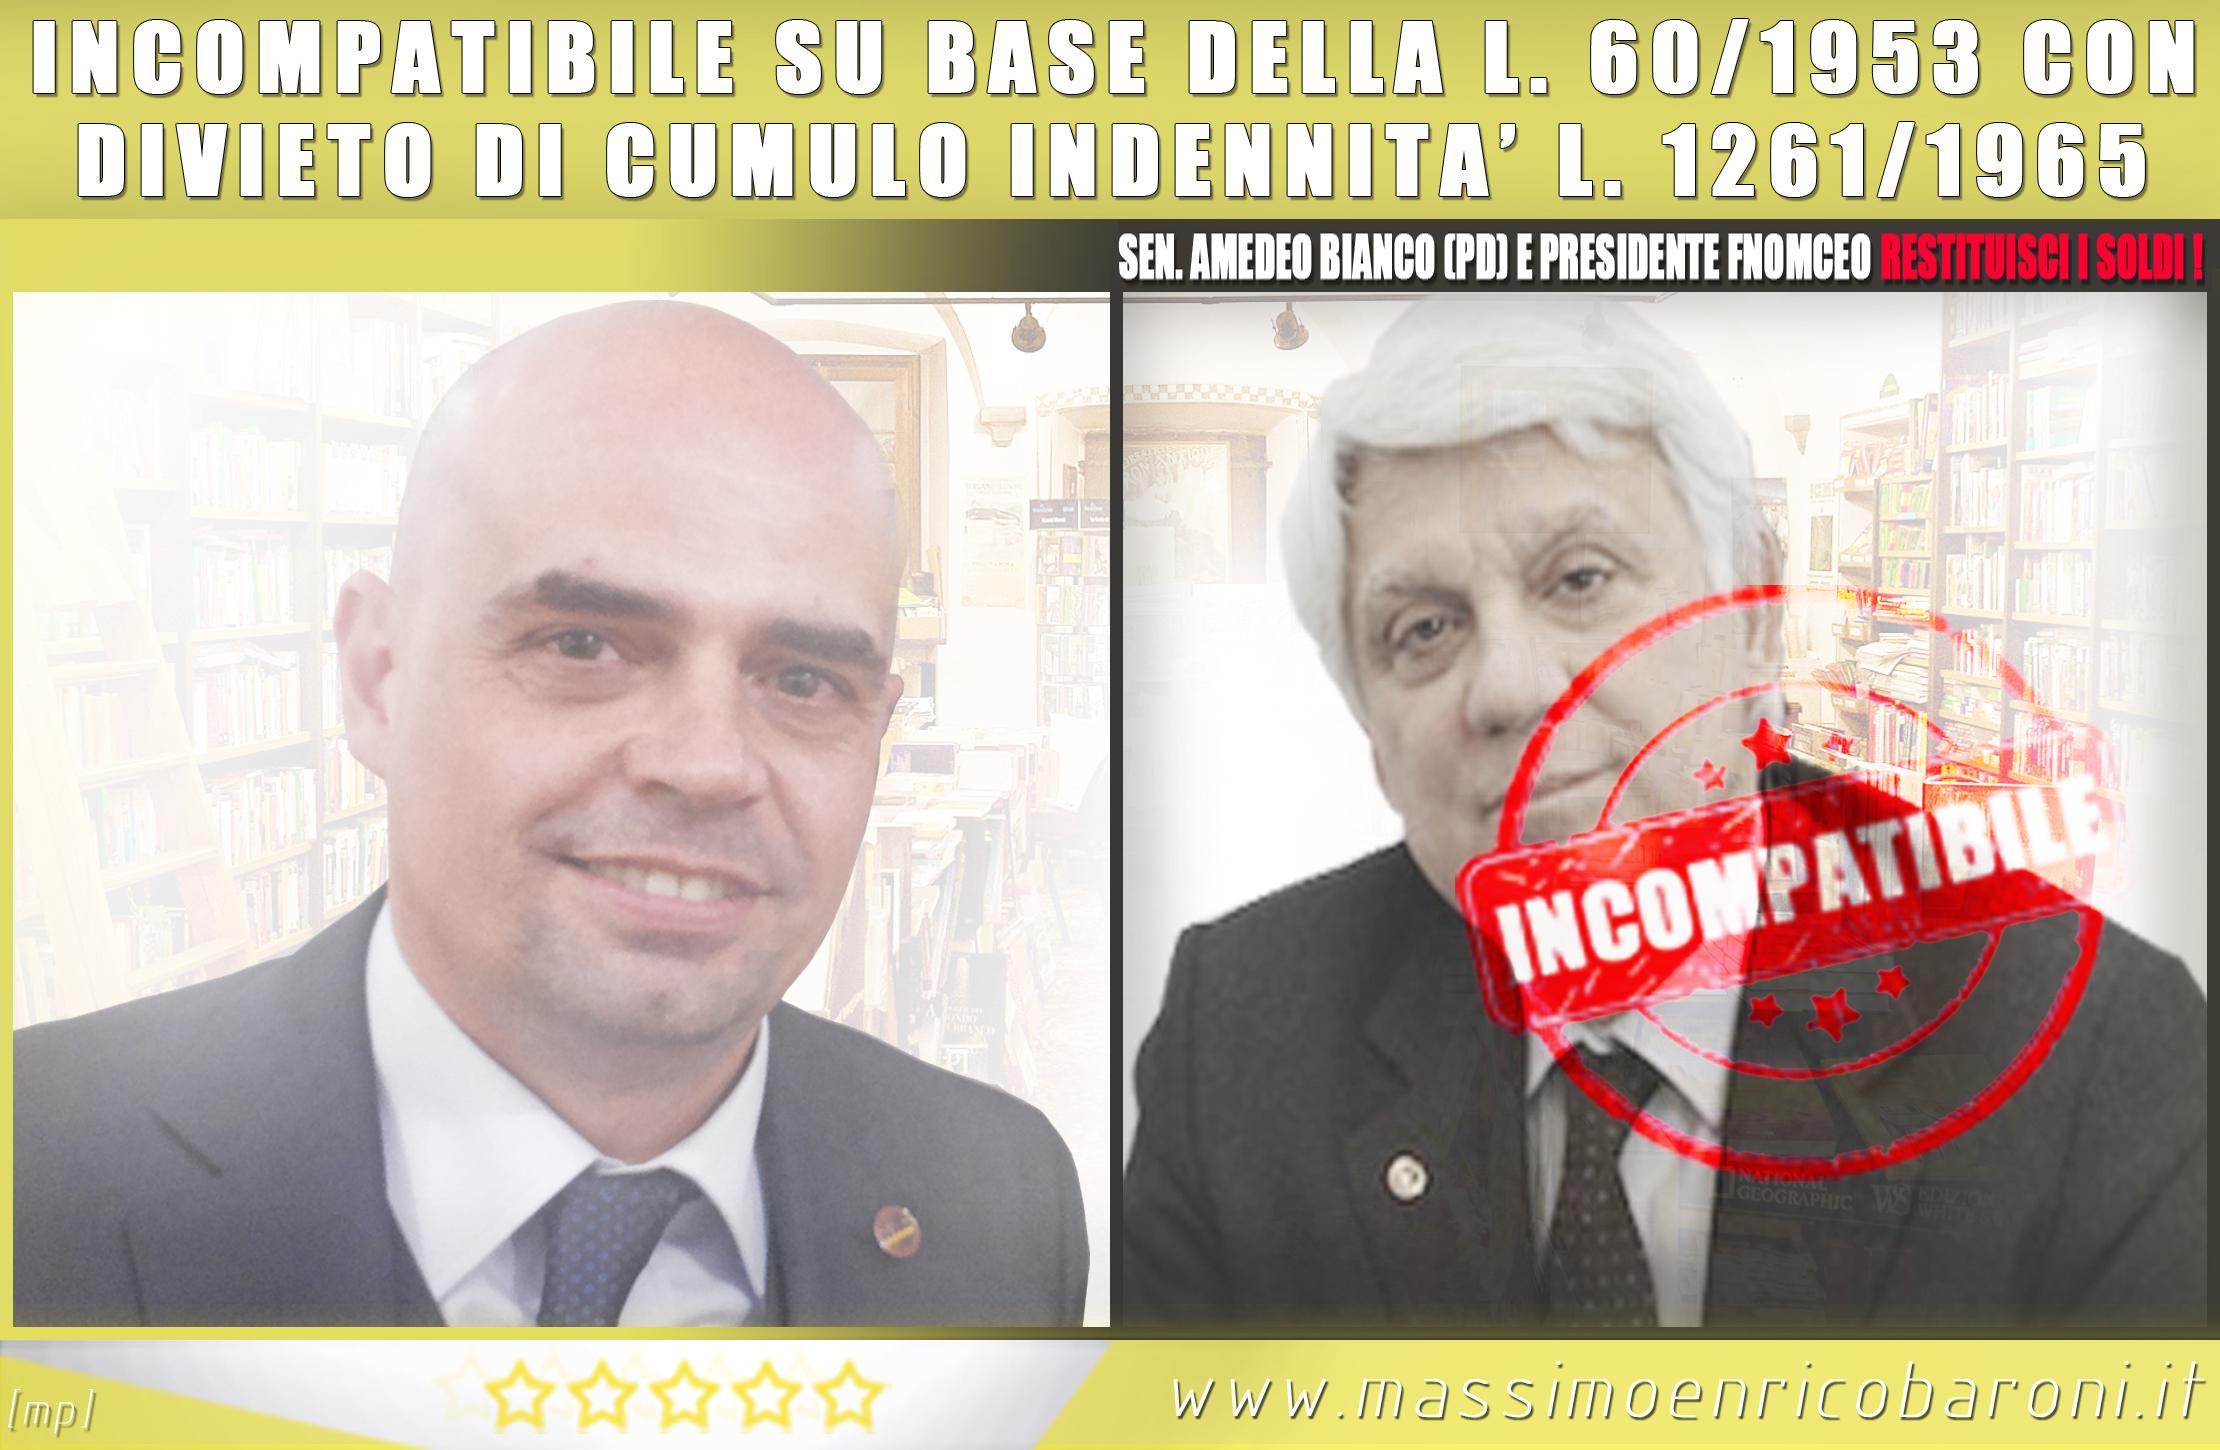 _POST_BARONI_BIANCOINCOMPATIBILE_DEFINITIVO_